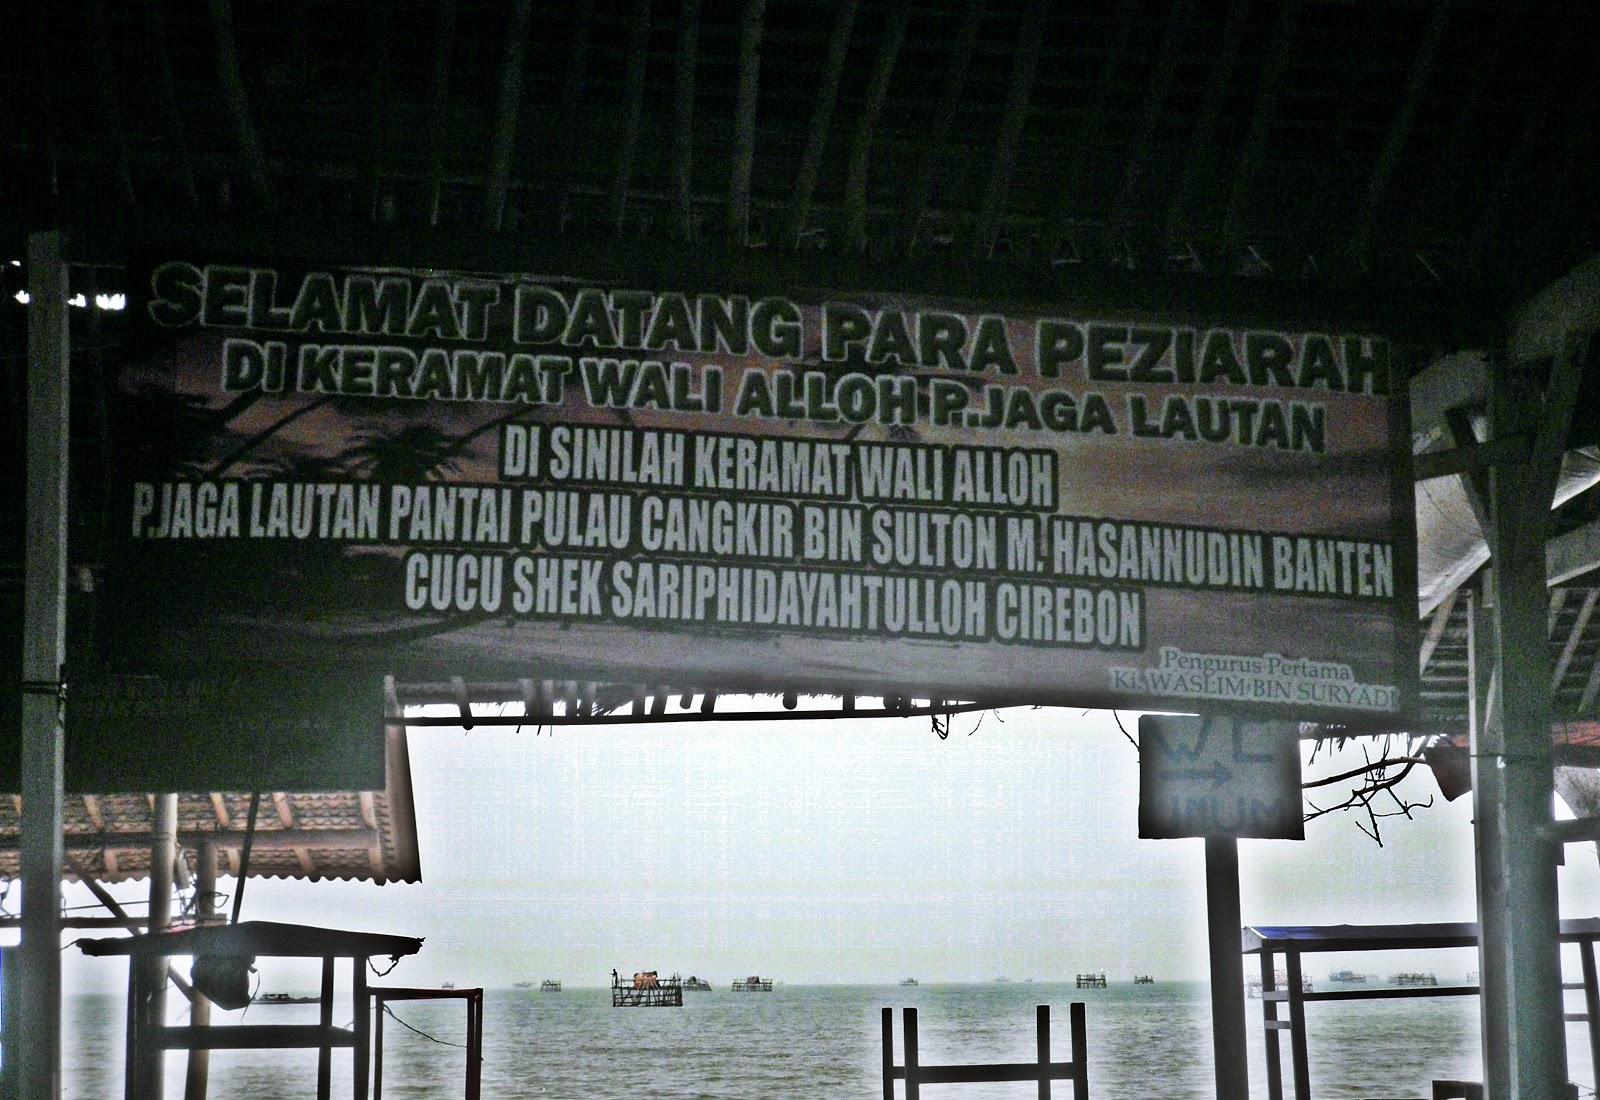 Petualang Pulau Cangkir Selamat Datang Kab Tangerang